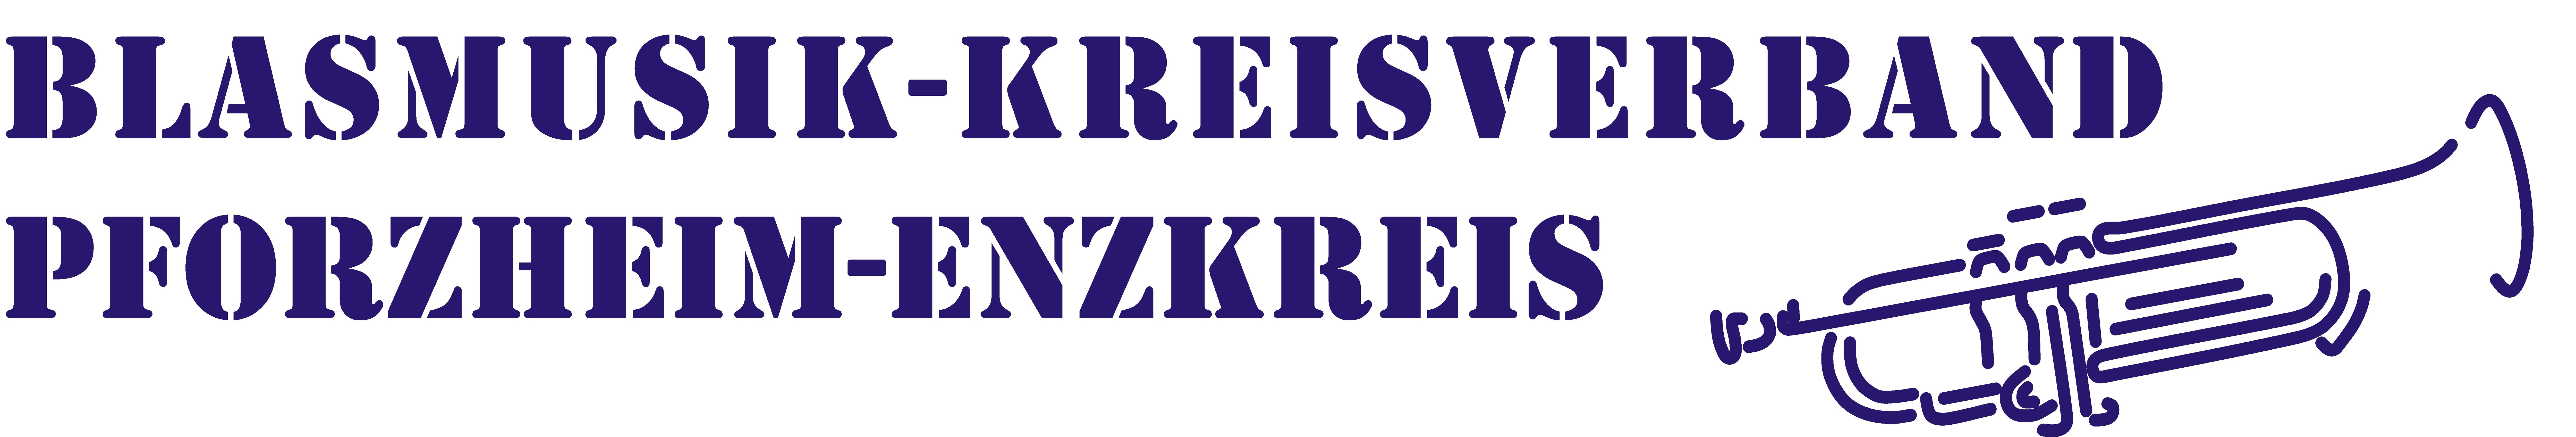 Blasmusik-Kreisverband Pforzheim-Enzkreis